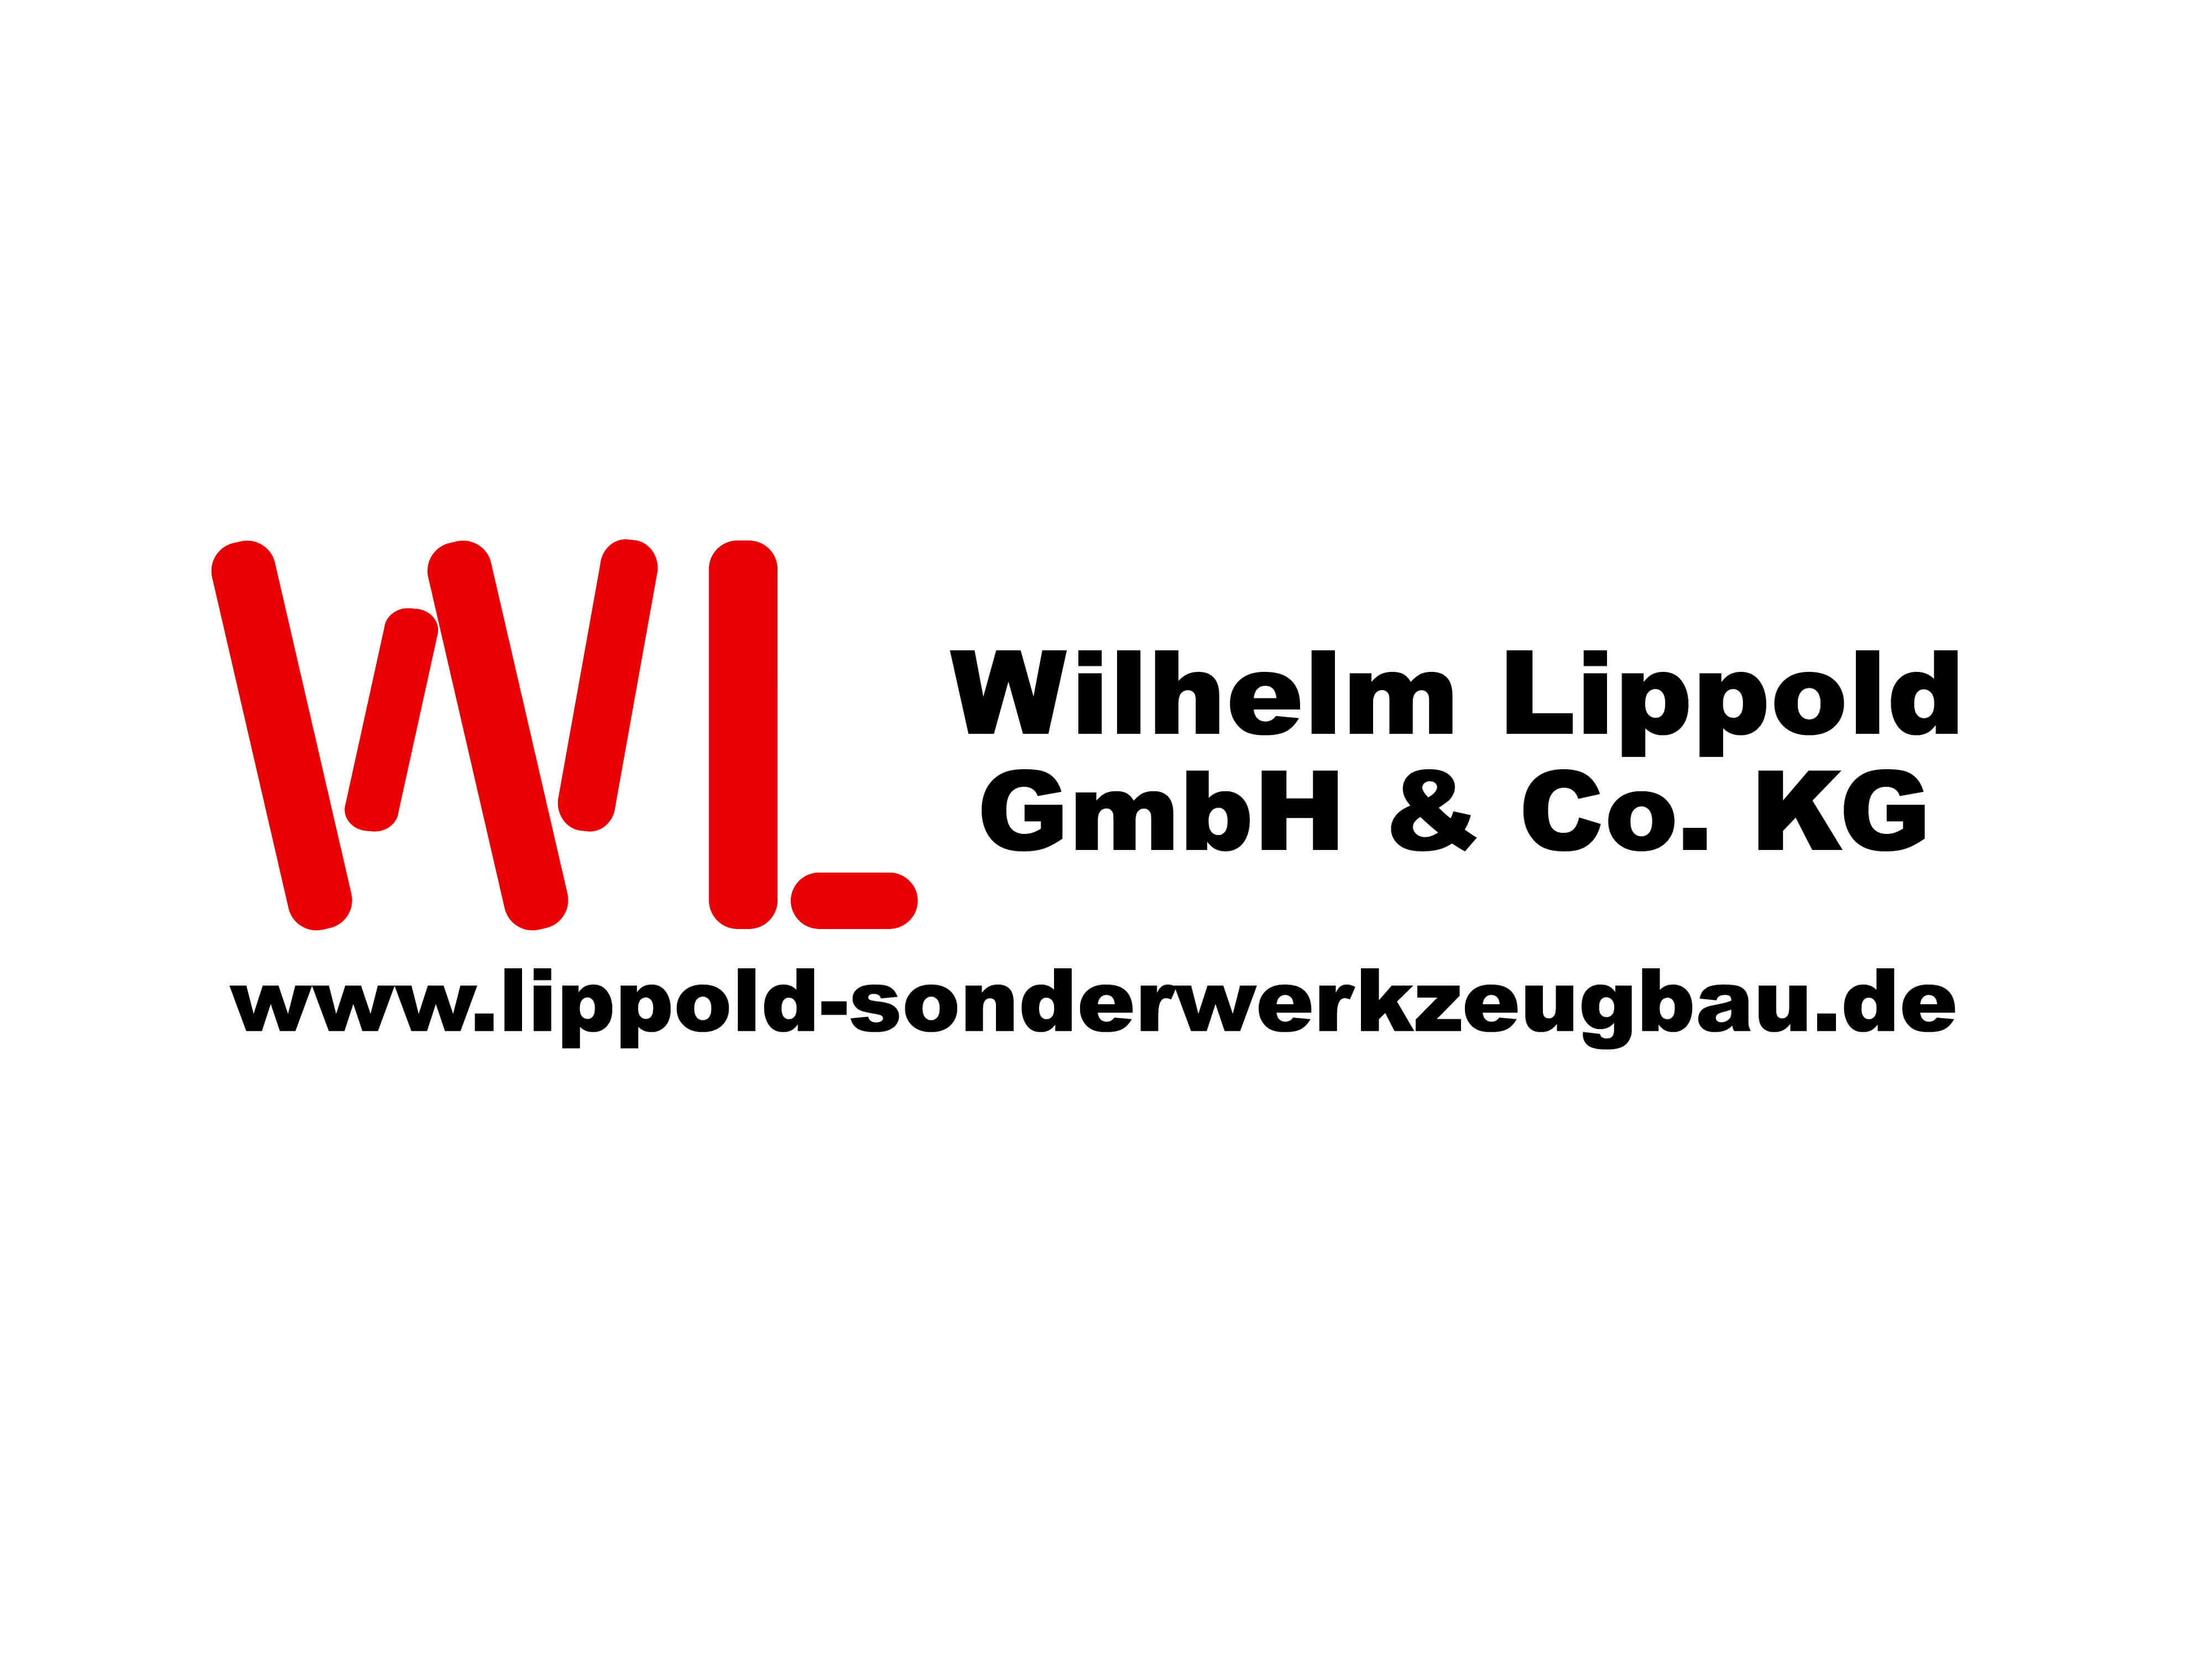 Wilhelm Lippold Sonderwerkzeugbau GmbH